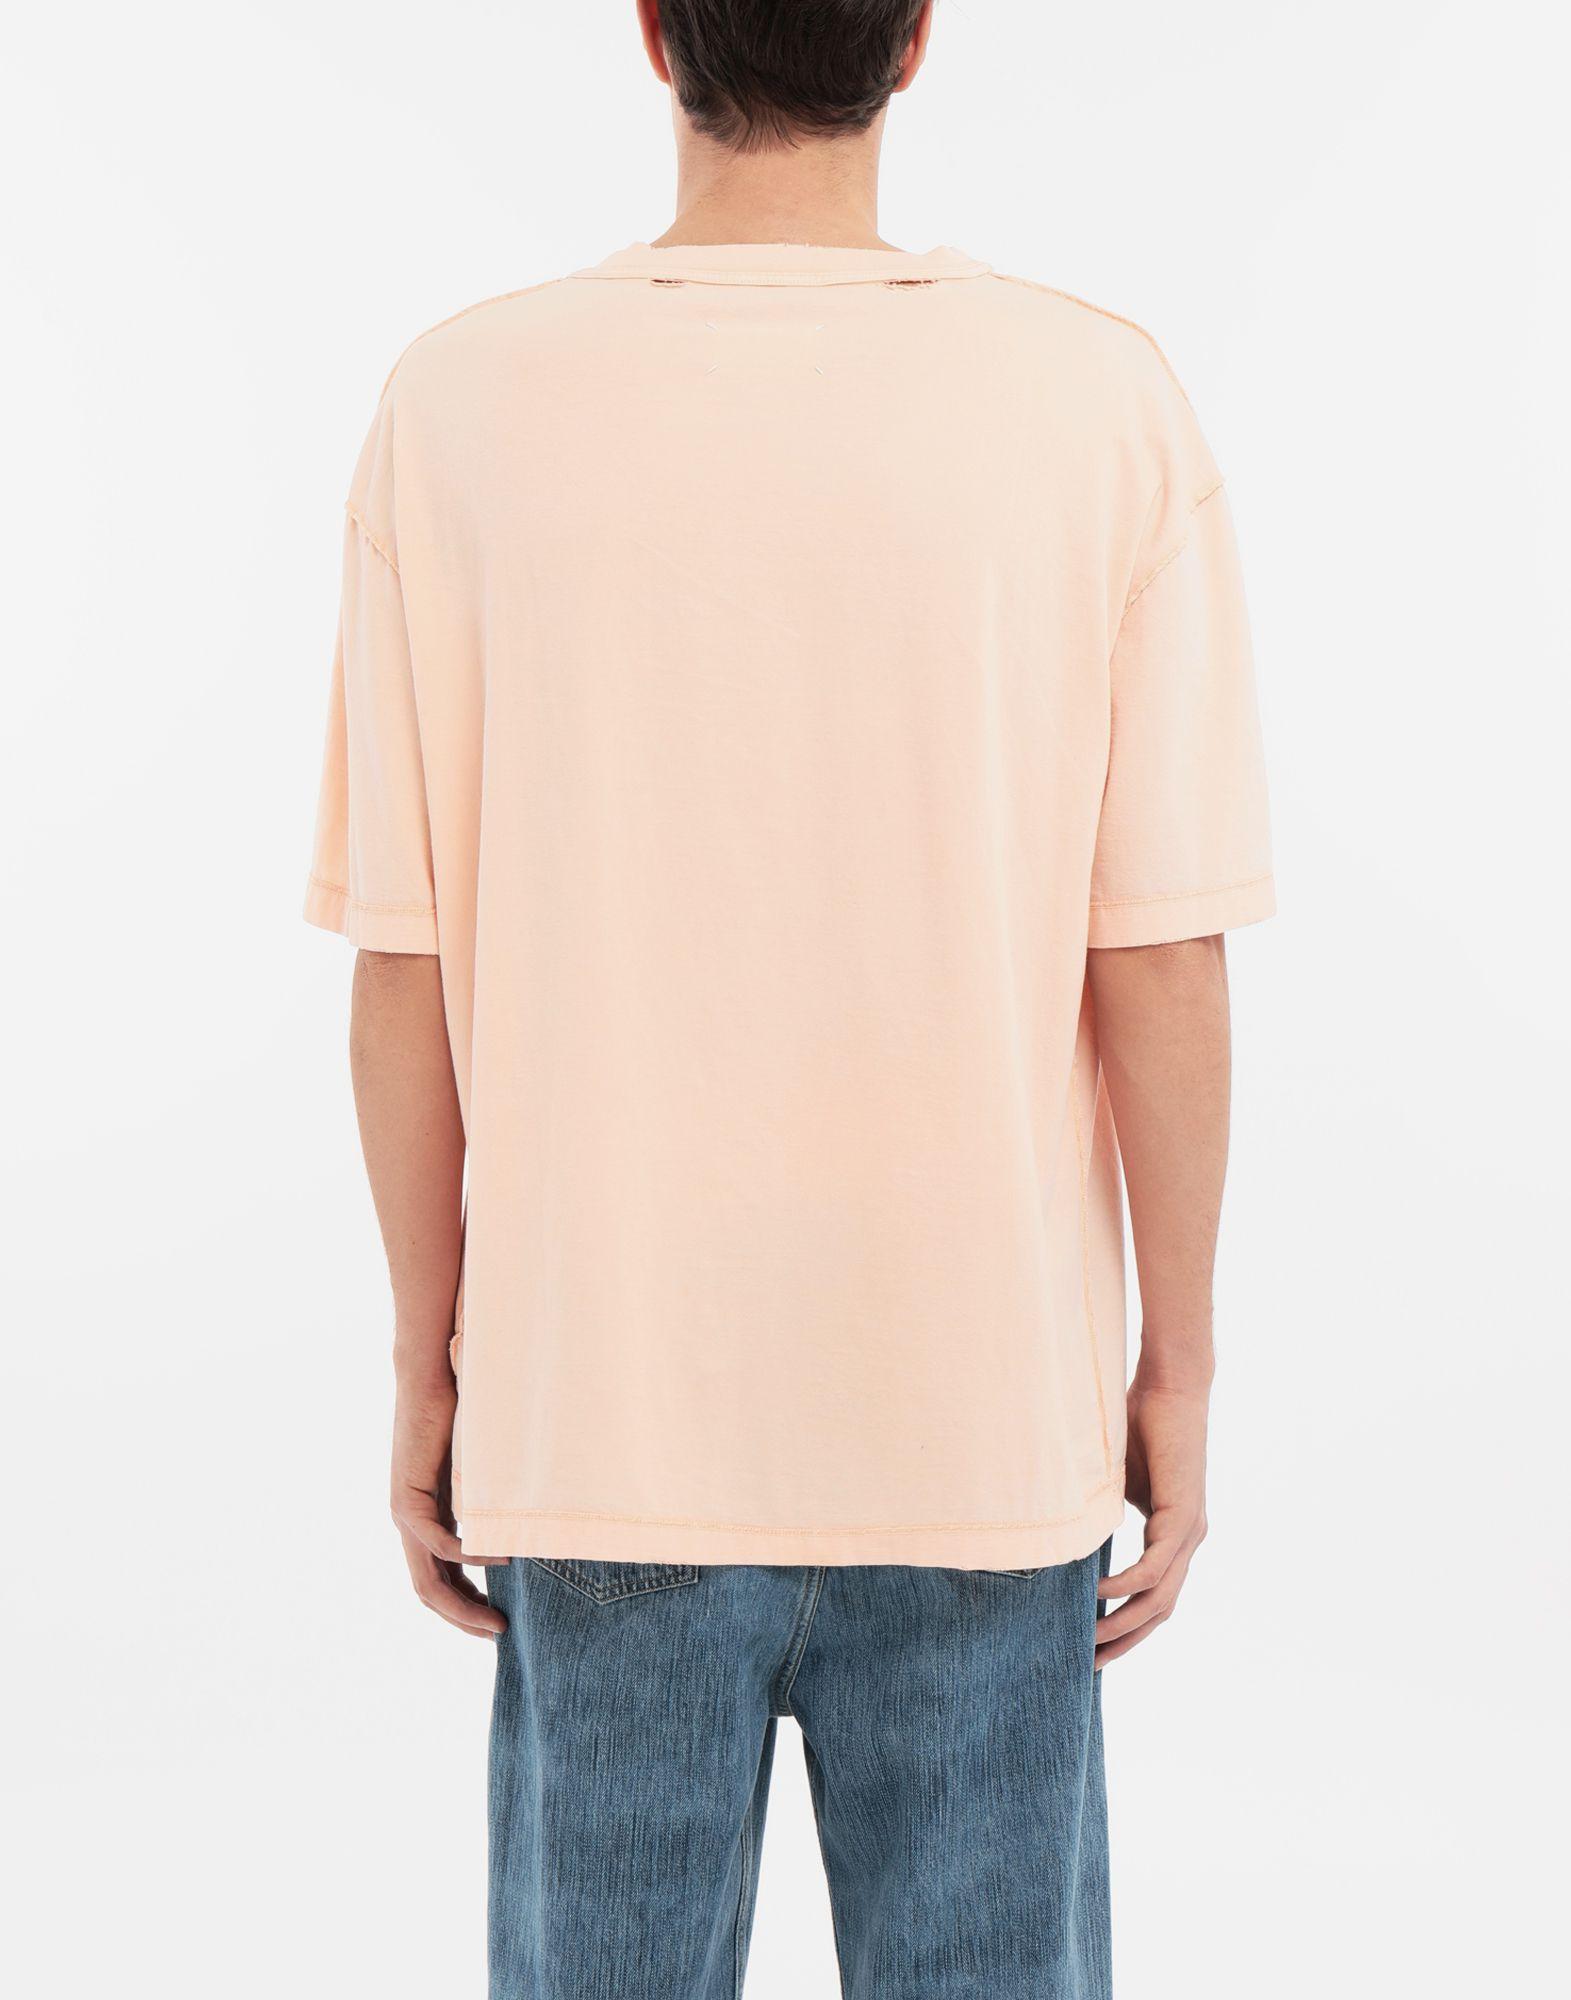 MAISON MARGIELA Graphic-print cotton T-shirt Short sleeve t-shirt Man e